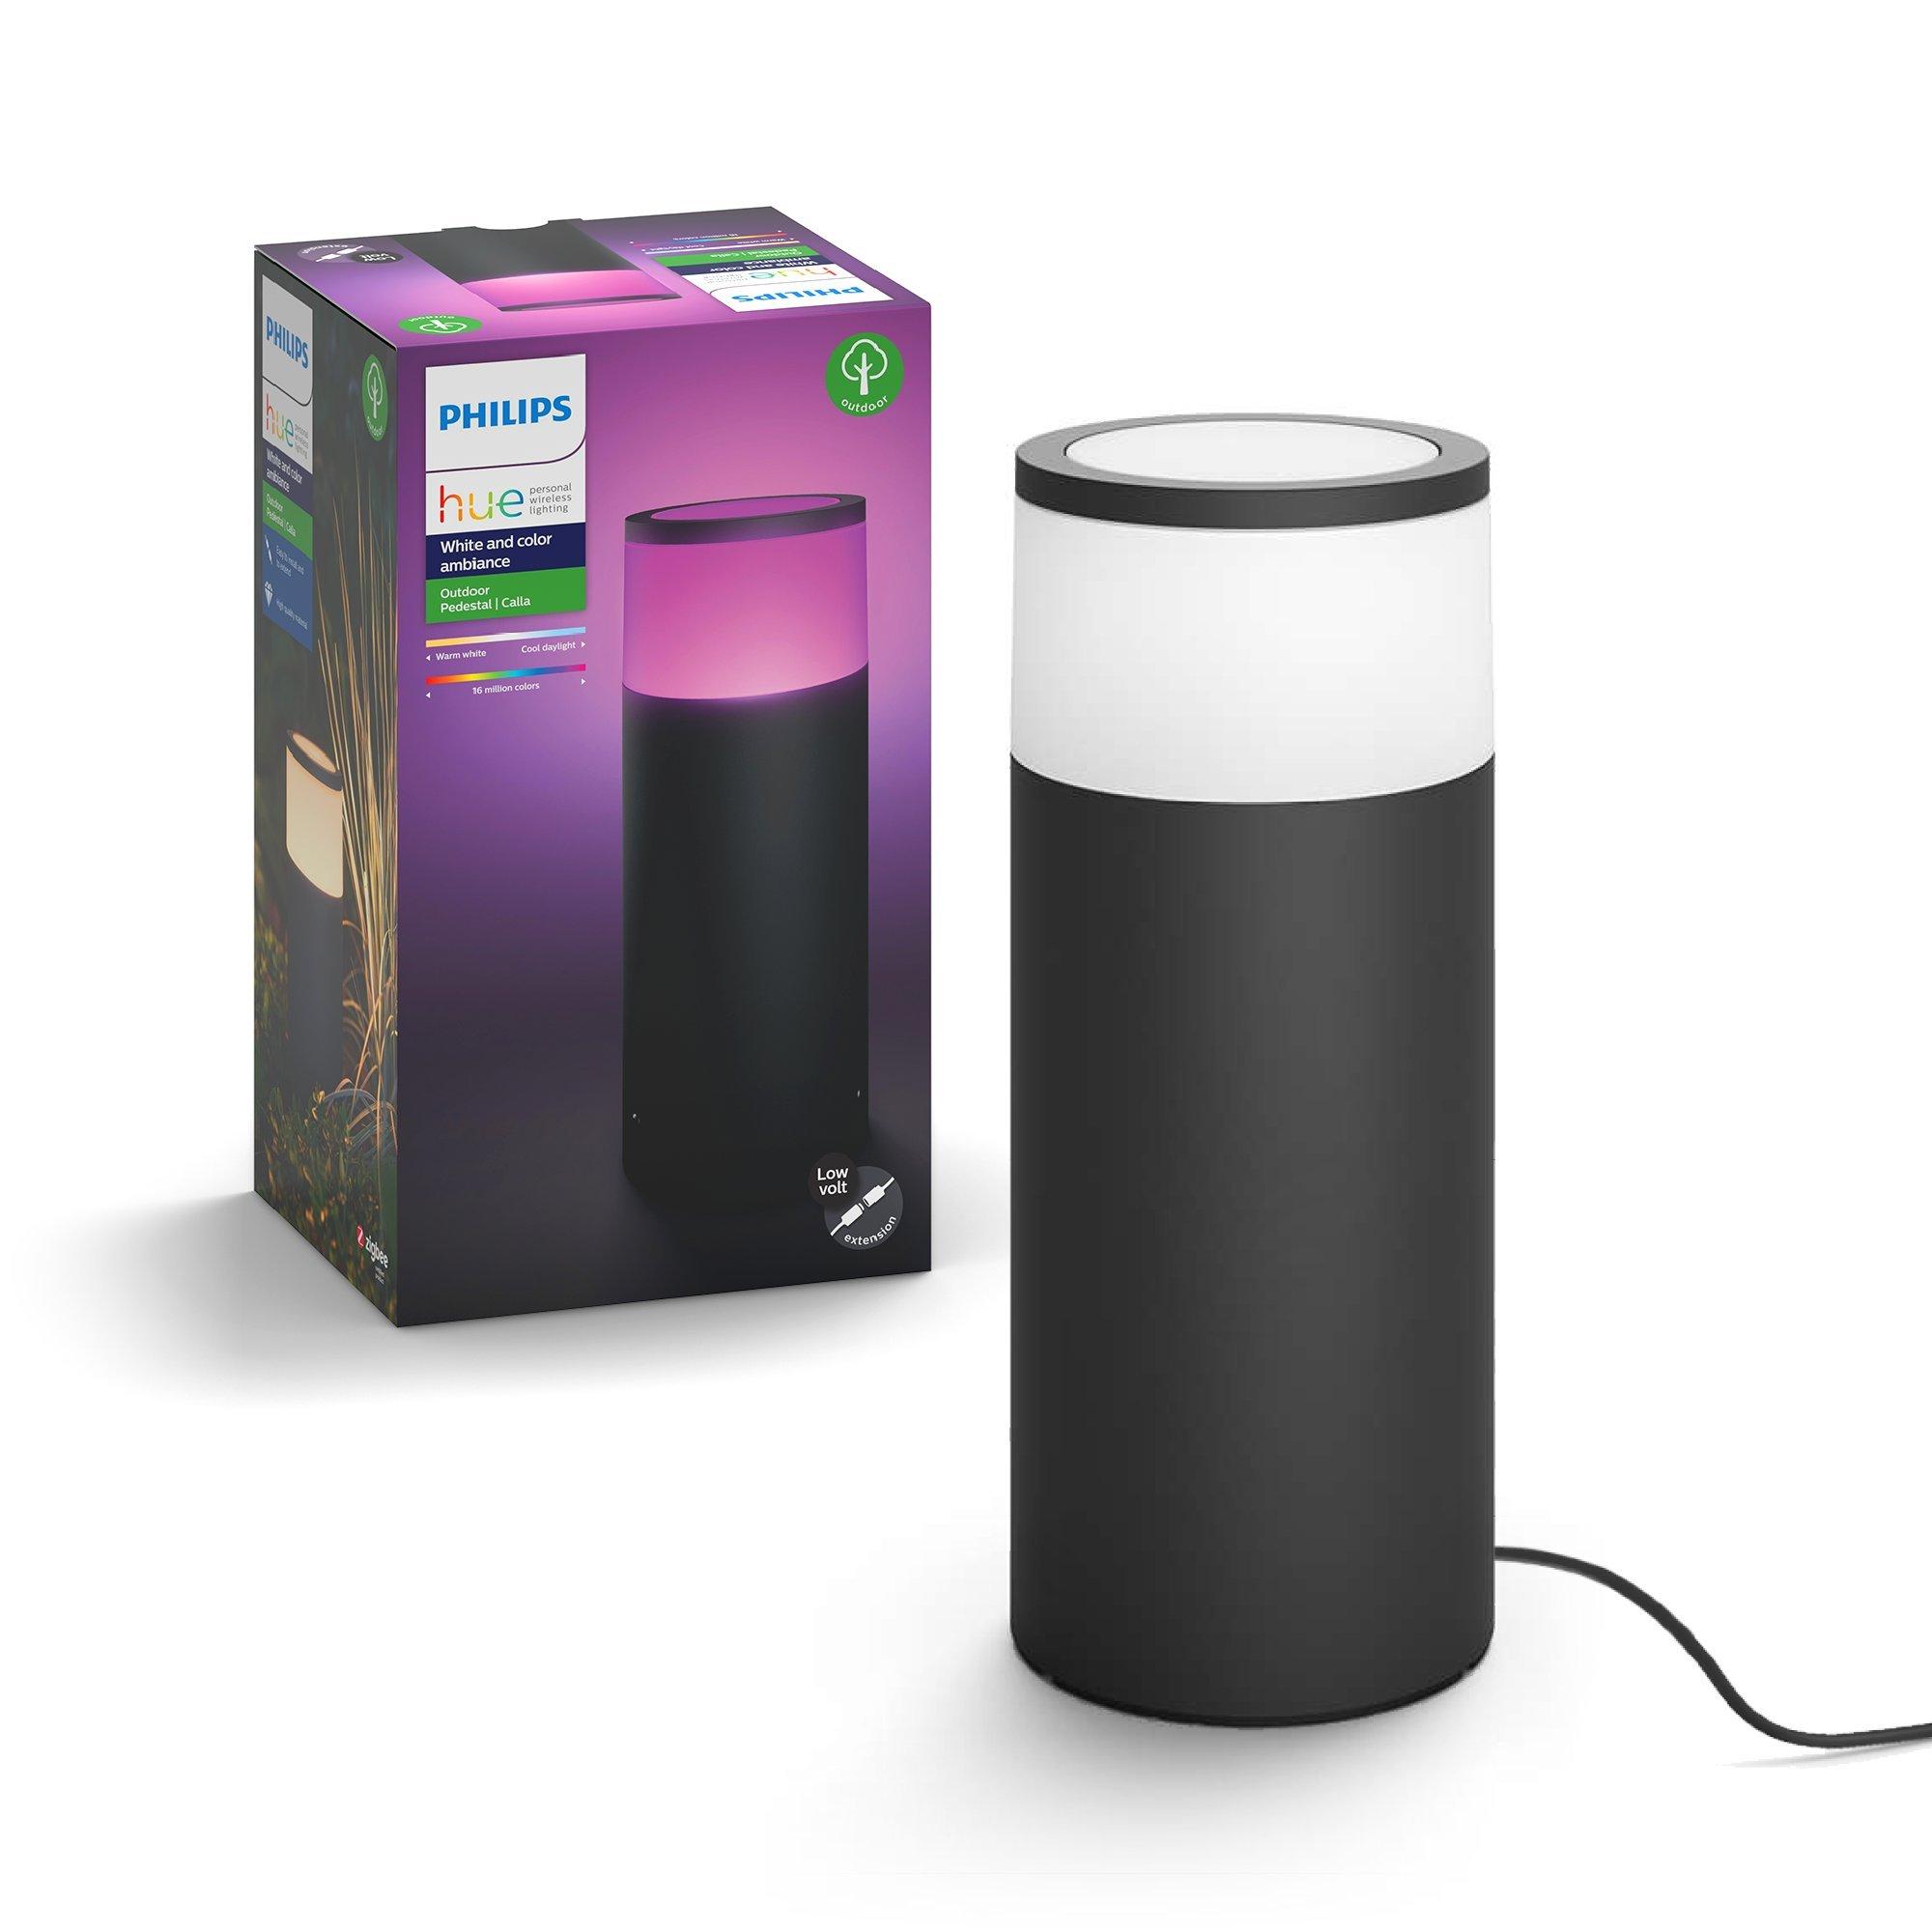 Philips Hue Calla White & Color Ambiance Outdoor Smart Pathway light extension (Hue Hub & Base Kit), 1 Hue White & Color Pathway light + mounting kit, Works with Alexa, HomeKit & Google Assistant